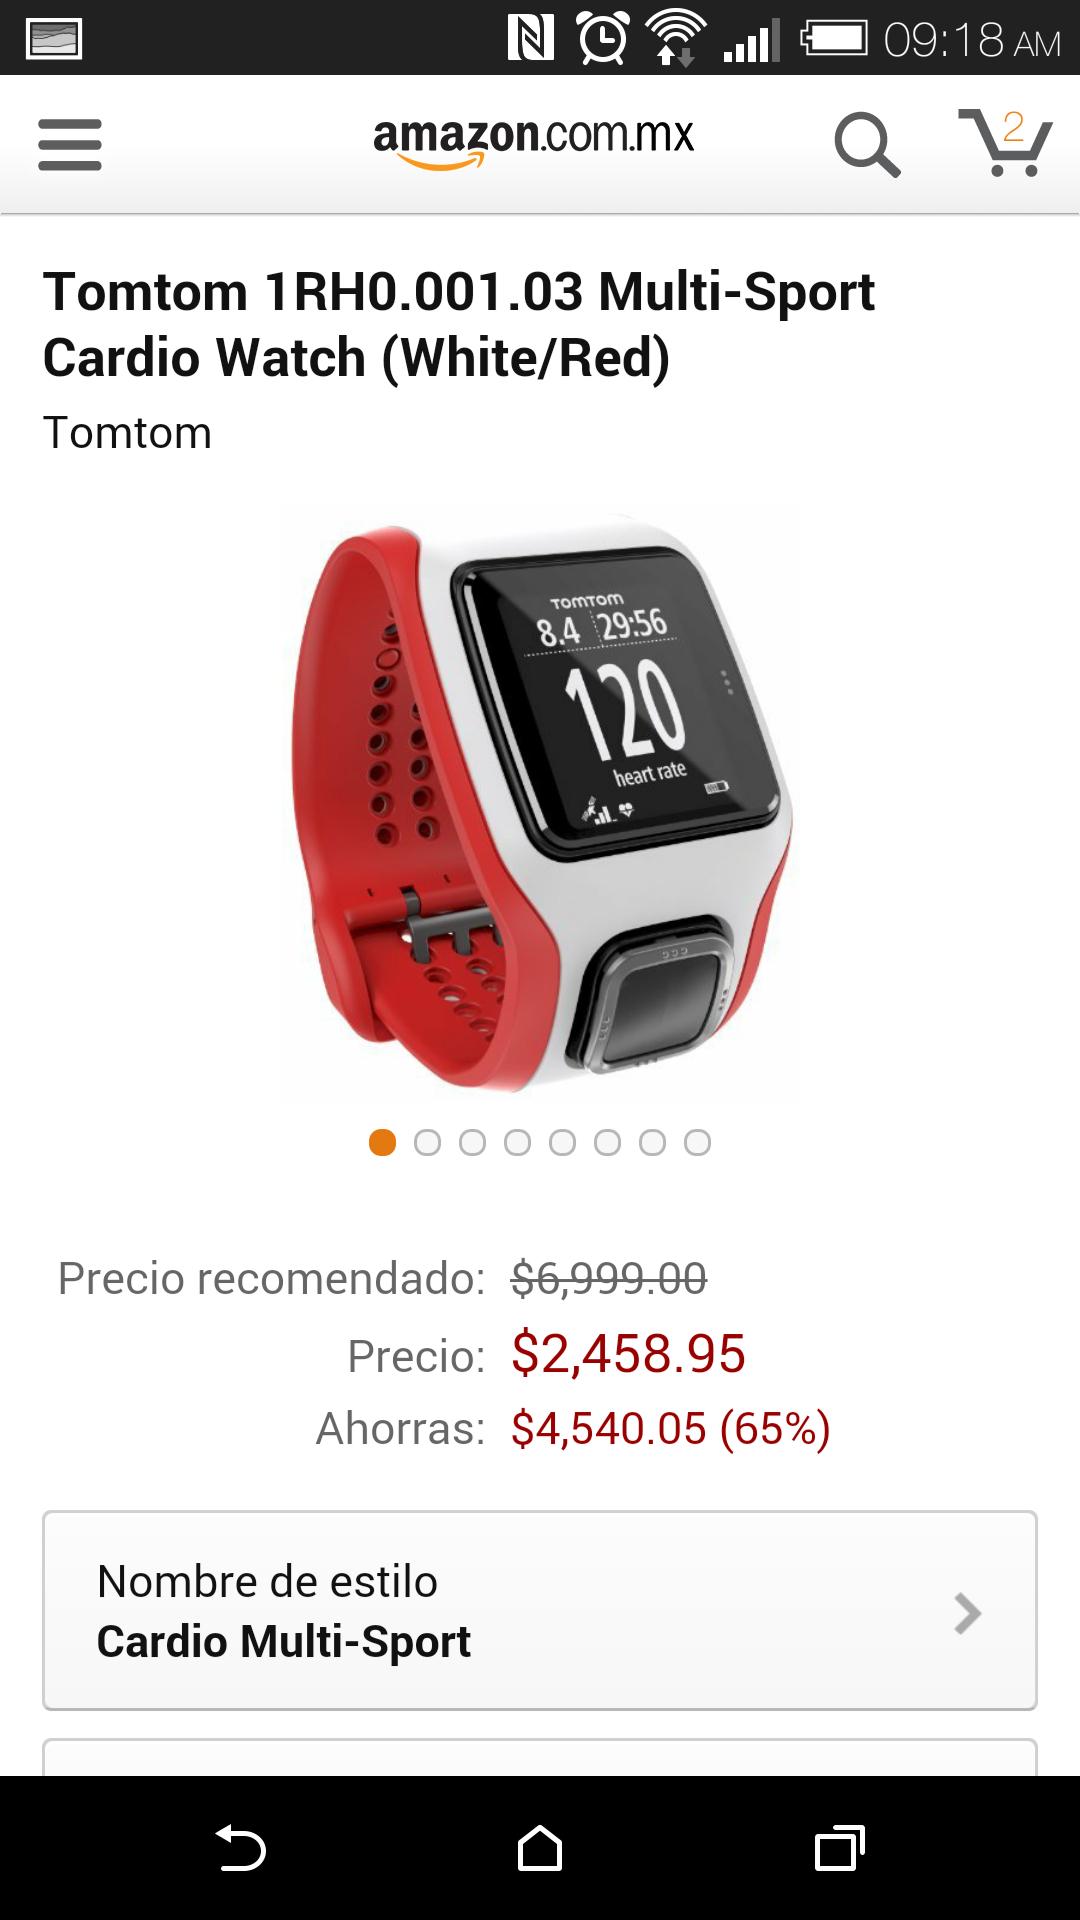 Amazon: Tomtom 1RH0.001.03 Multi-Sport Cardio Watch